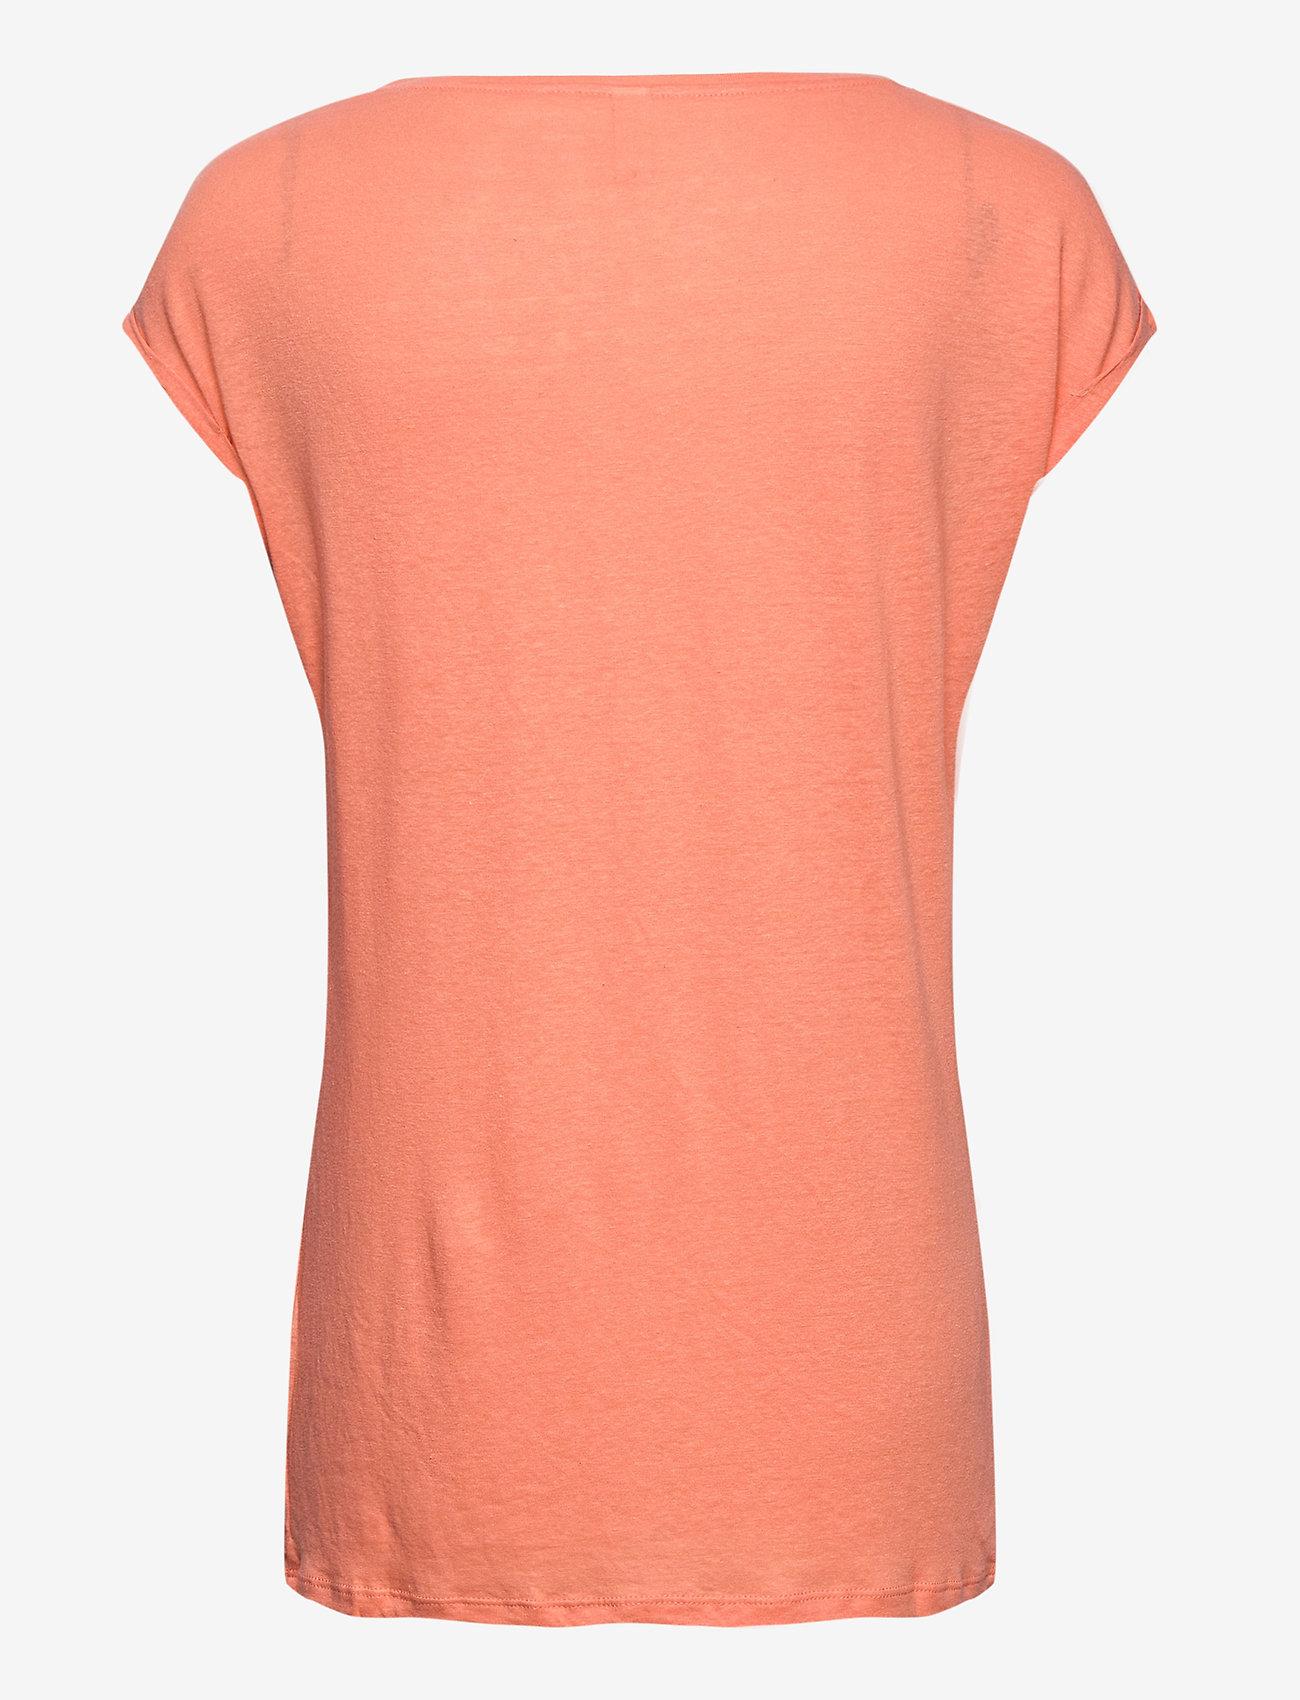 Soyaconcept - SC-ISABEL - t-shirts - peach - 1